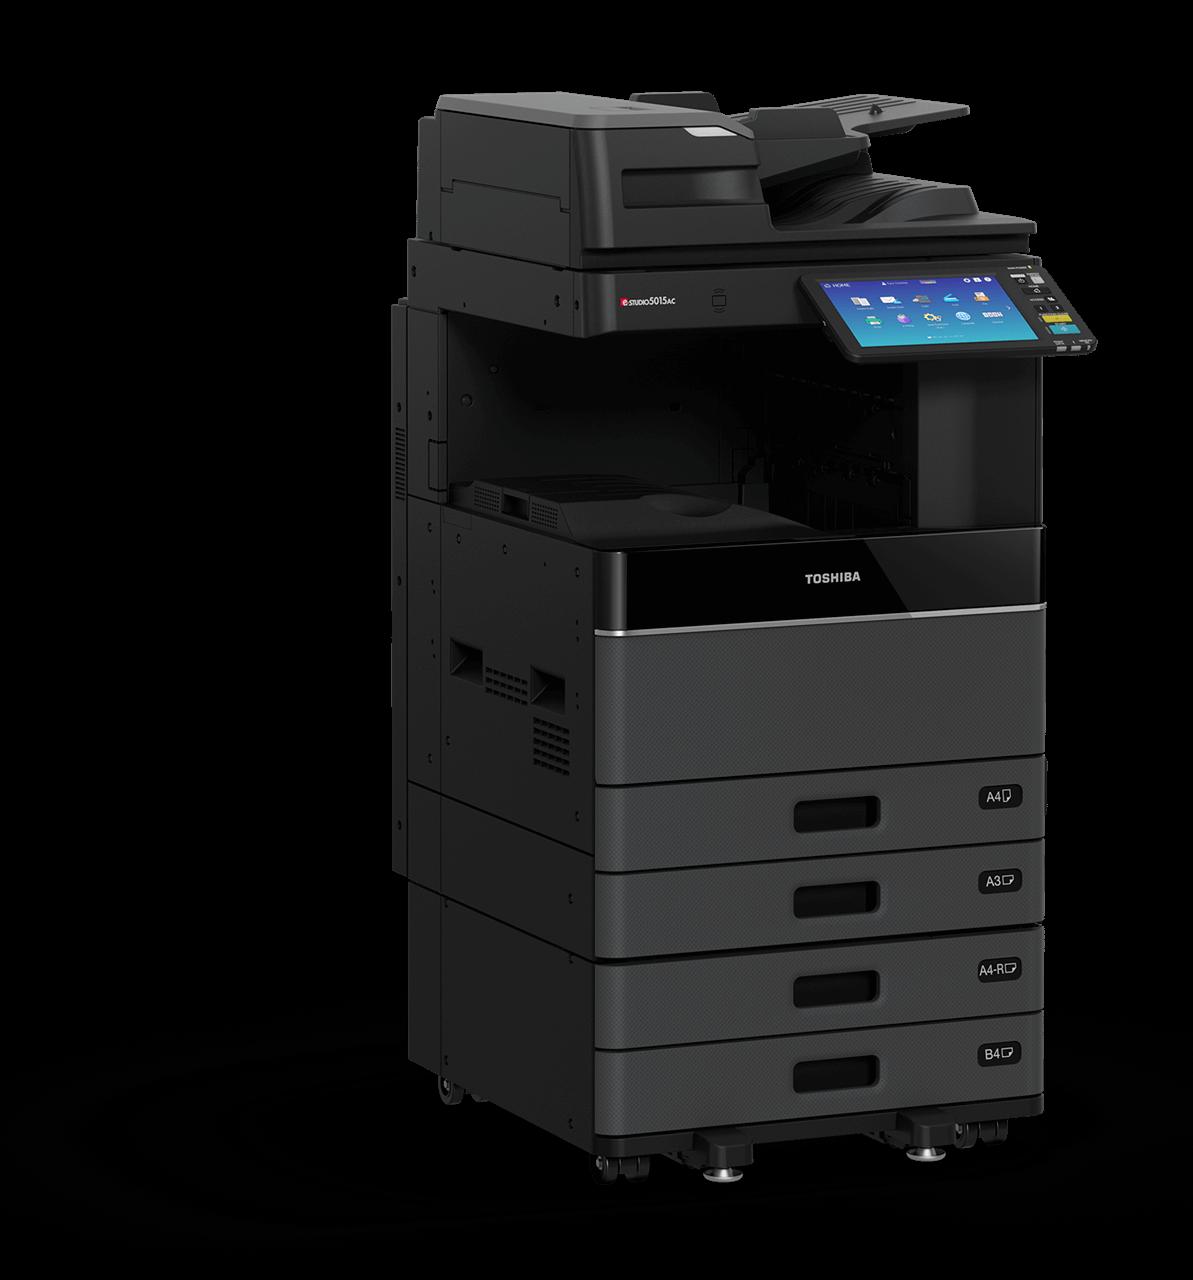 Cho thuê máy photocopy màu toshiba 5005AC